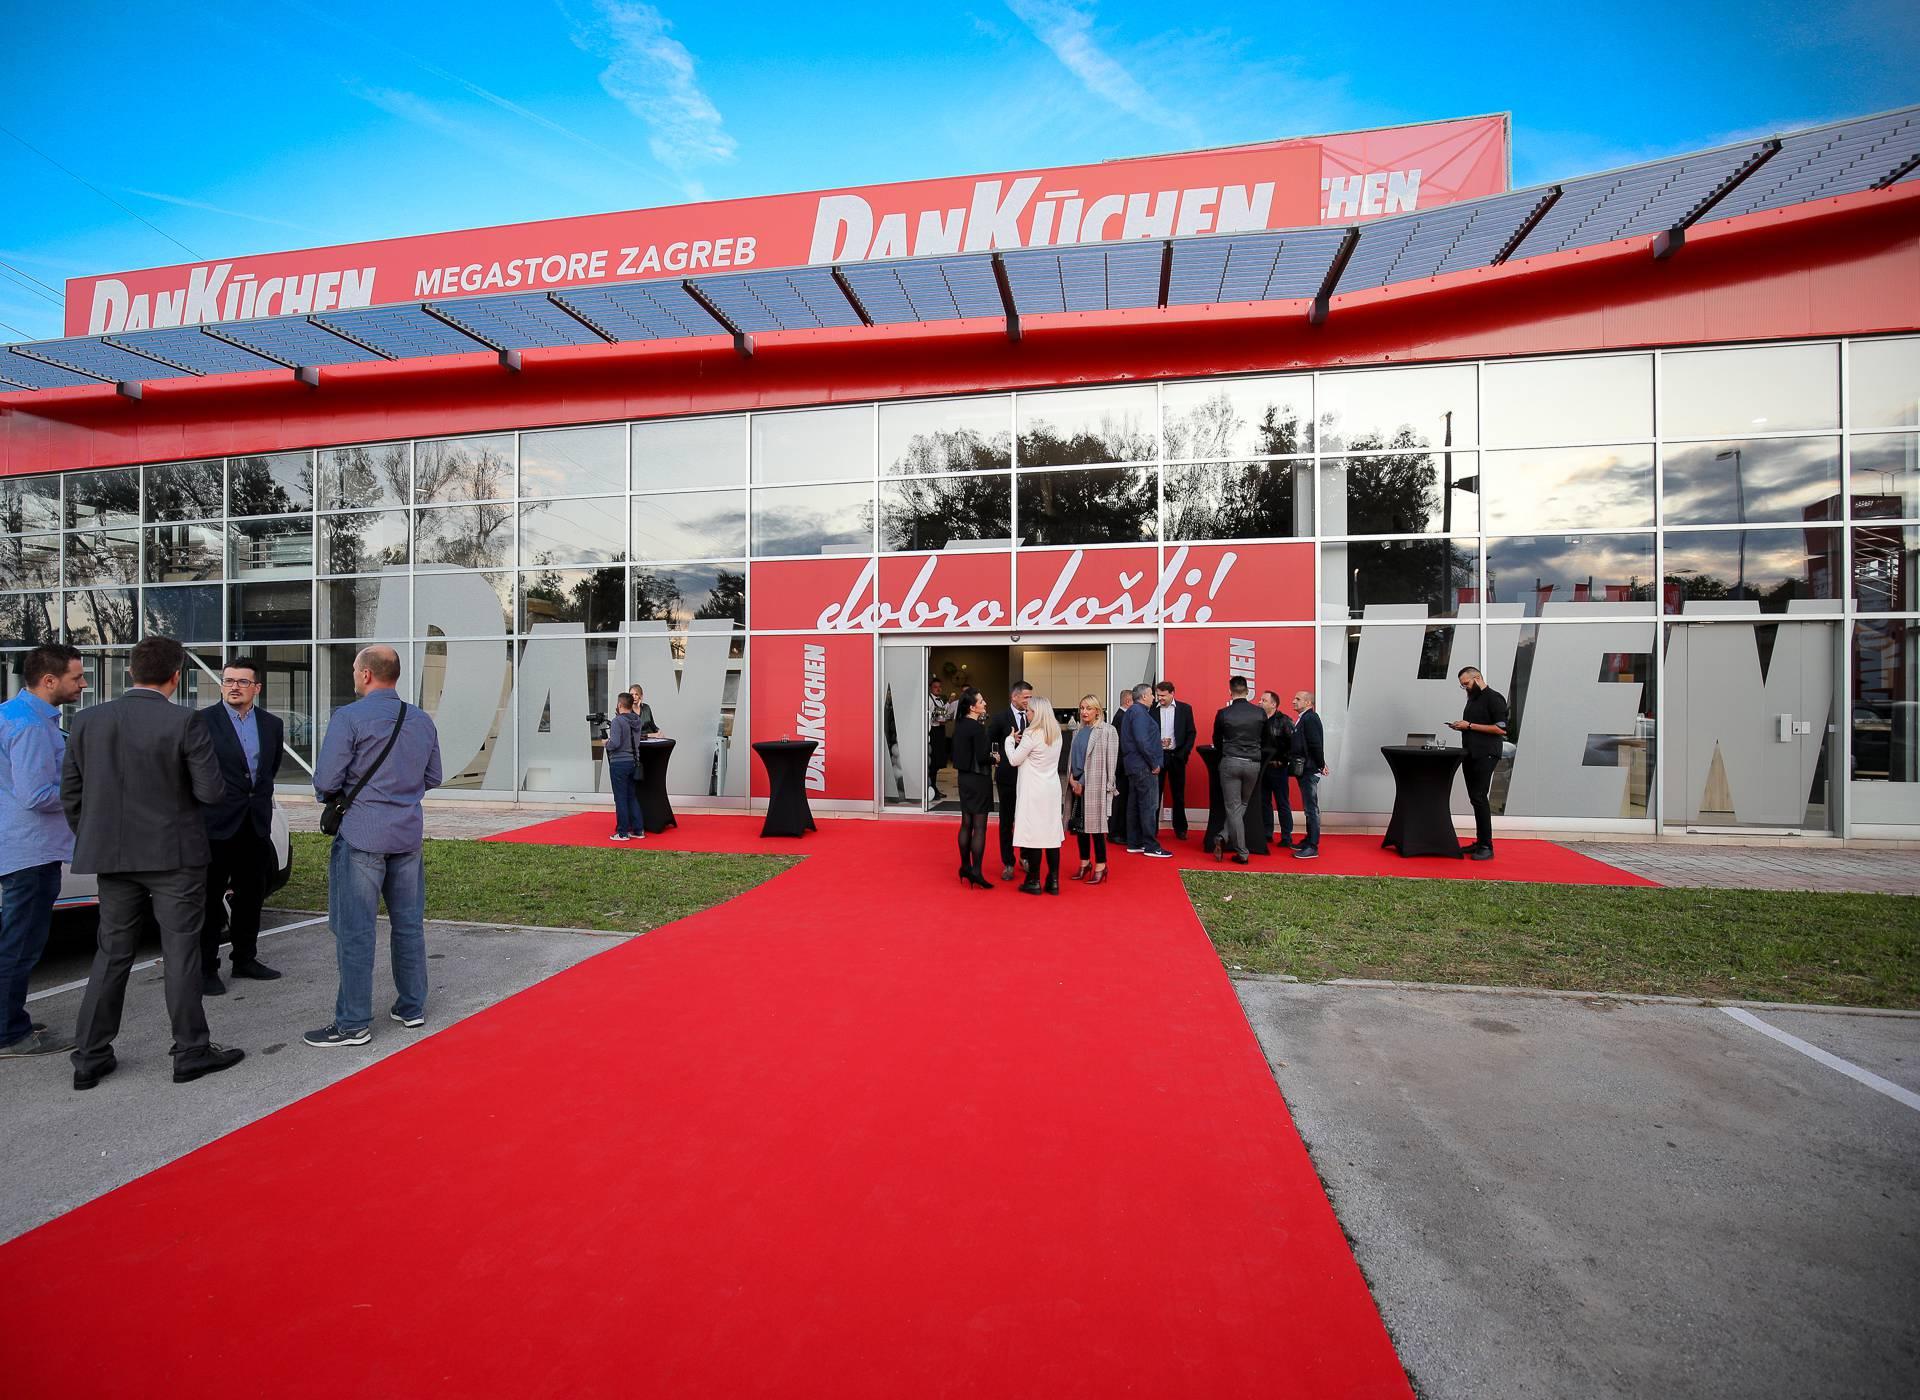 Zagreb: Otvoren najveći europski Danküchen Megastore